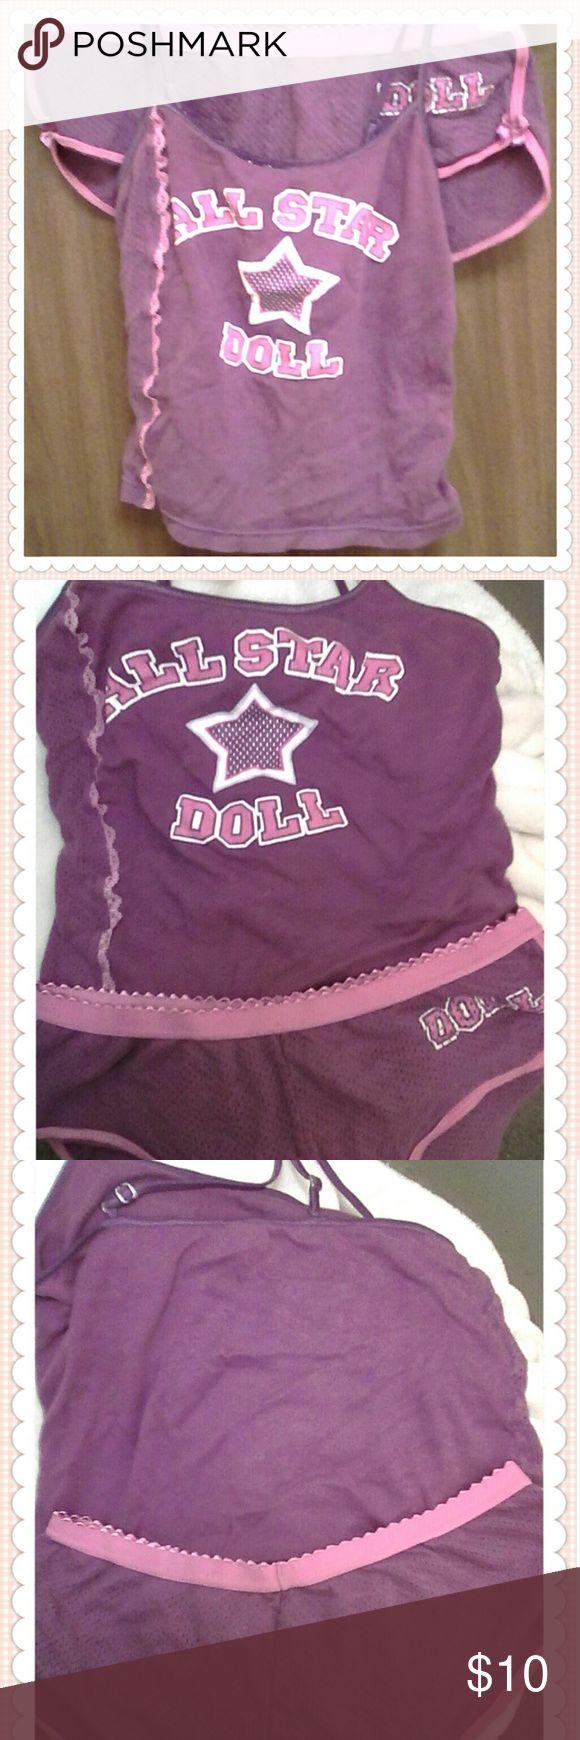 Ladies pajama set~ Pink and purple ladies sleepwear set~Cami tank top with adjustable straps and short shorts for those hot Summer nights!! No Boundaries Intimates & Sleepwear Pajamas